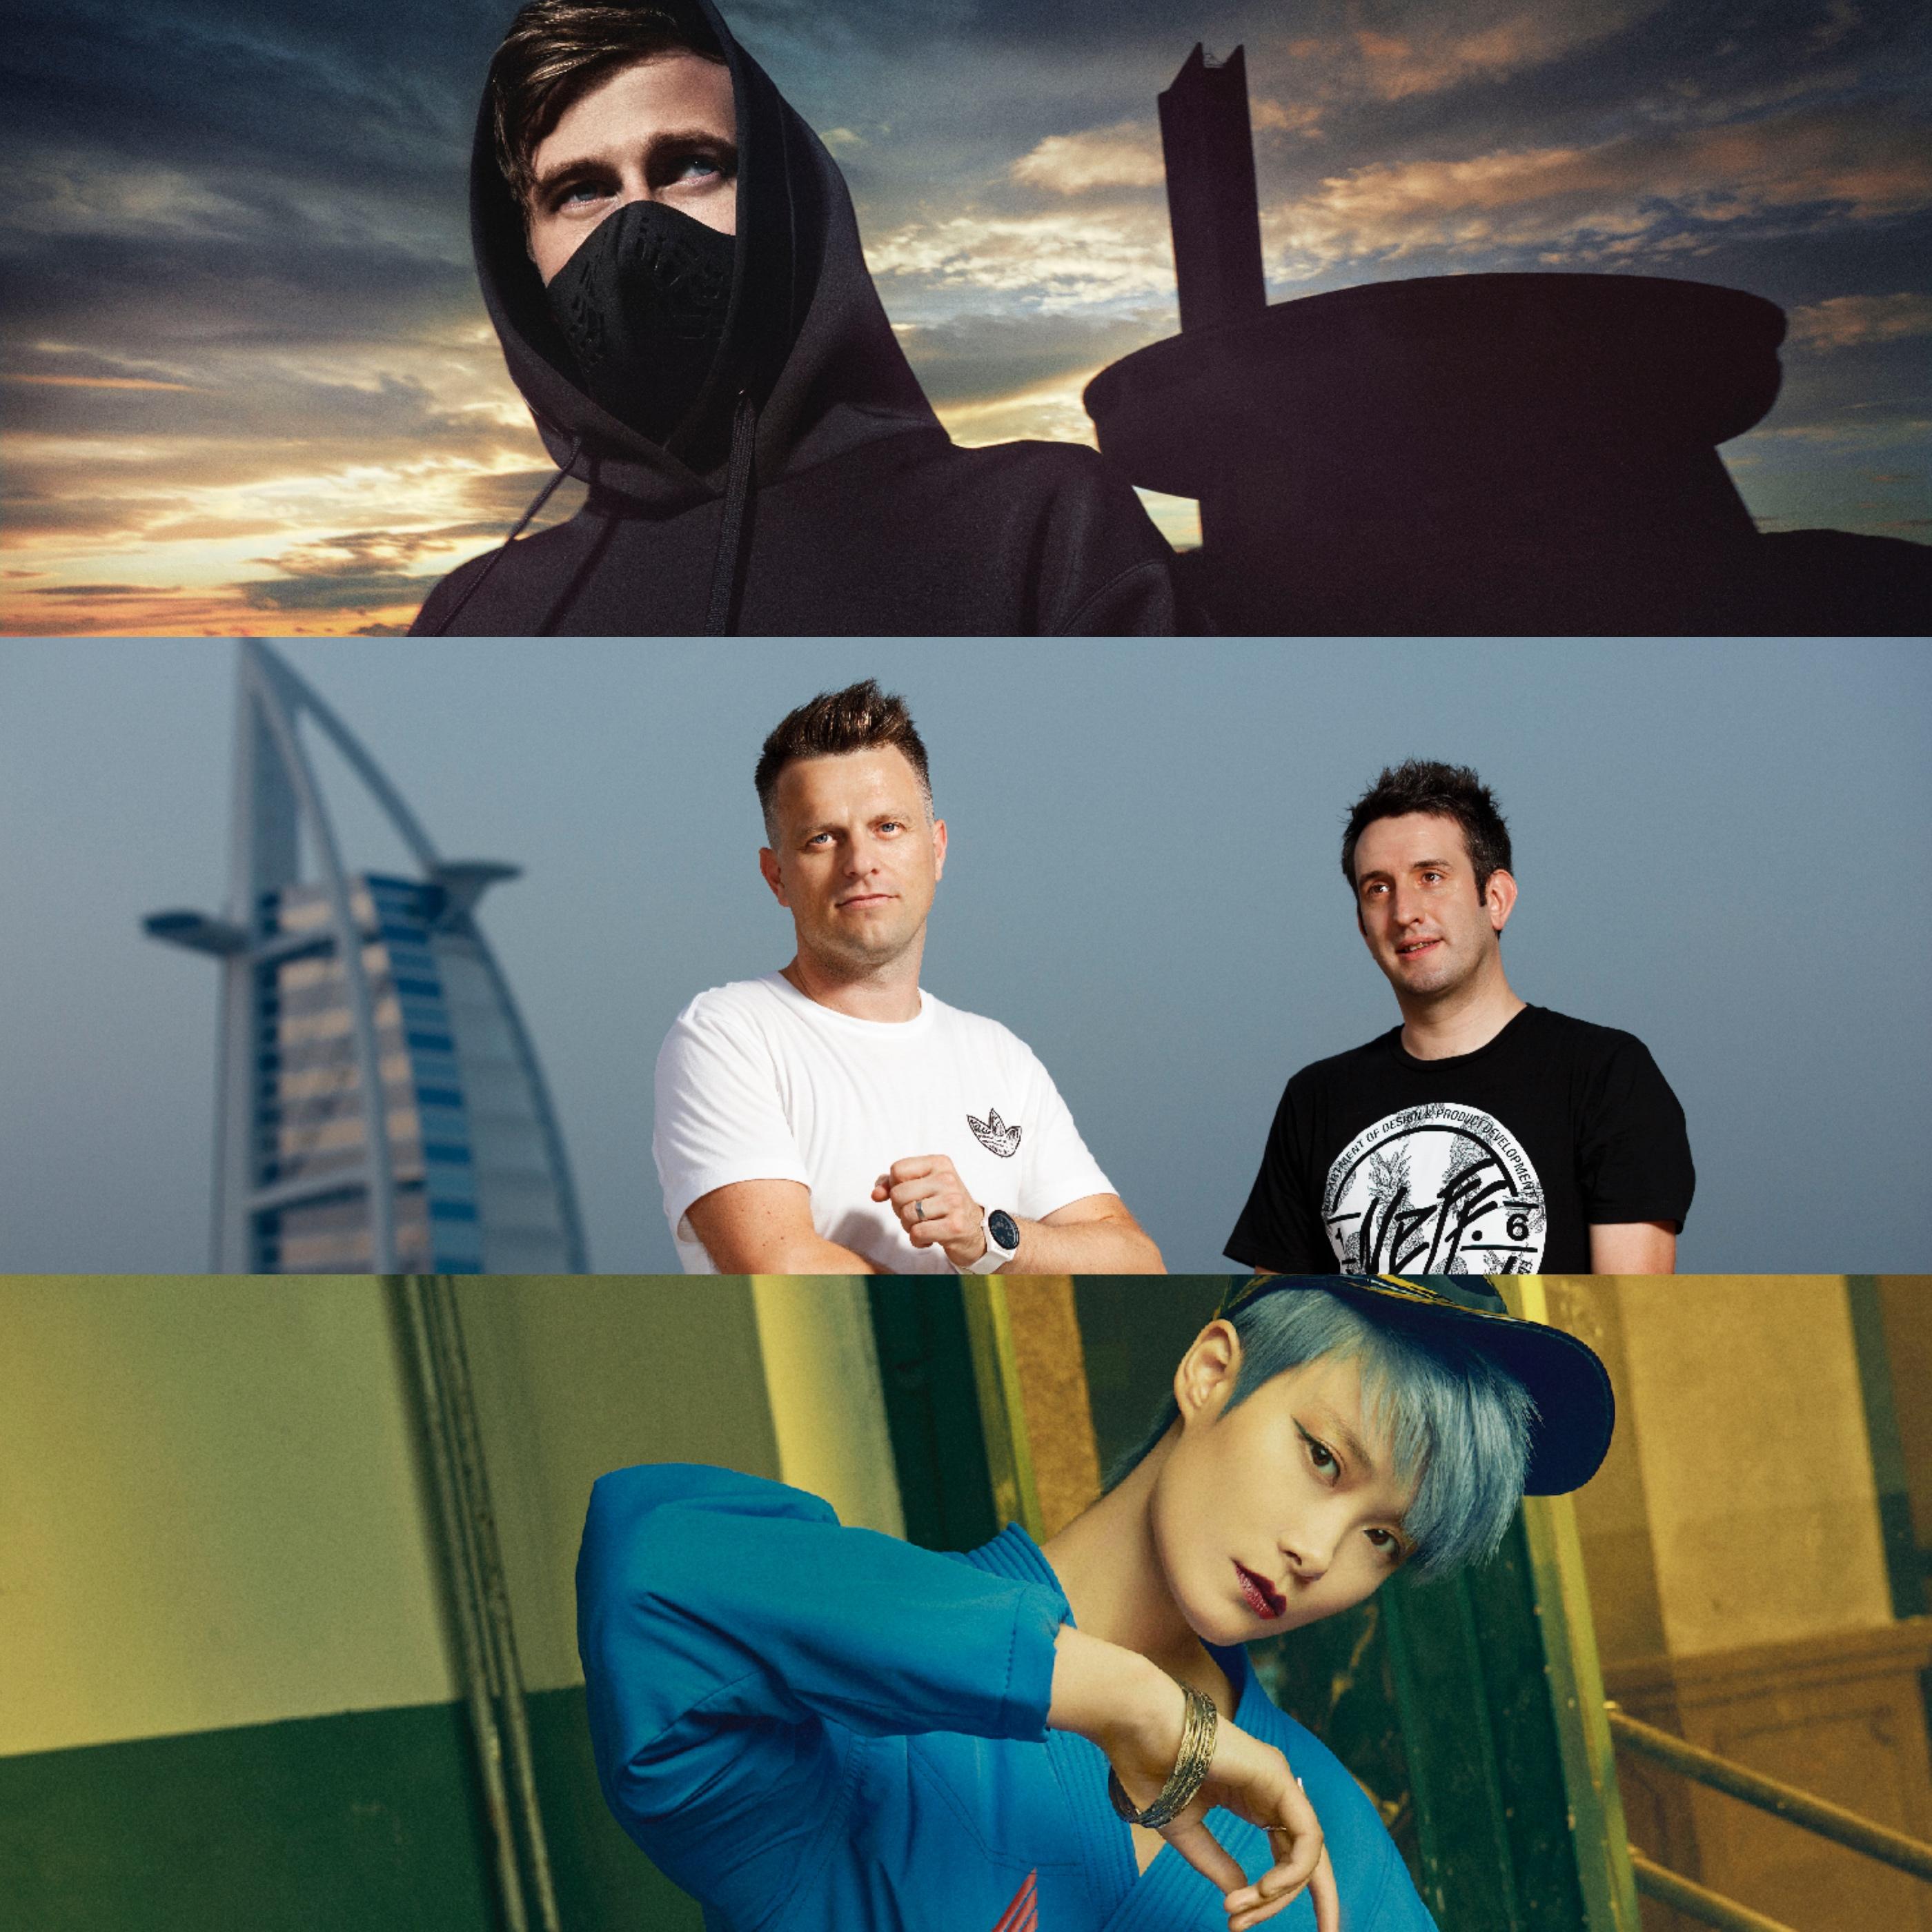 Introducing New Label Liquid State  'East Meets West on the Dancefloor'